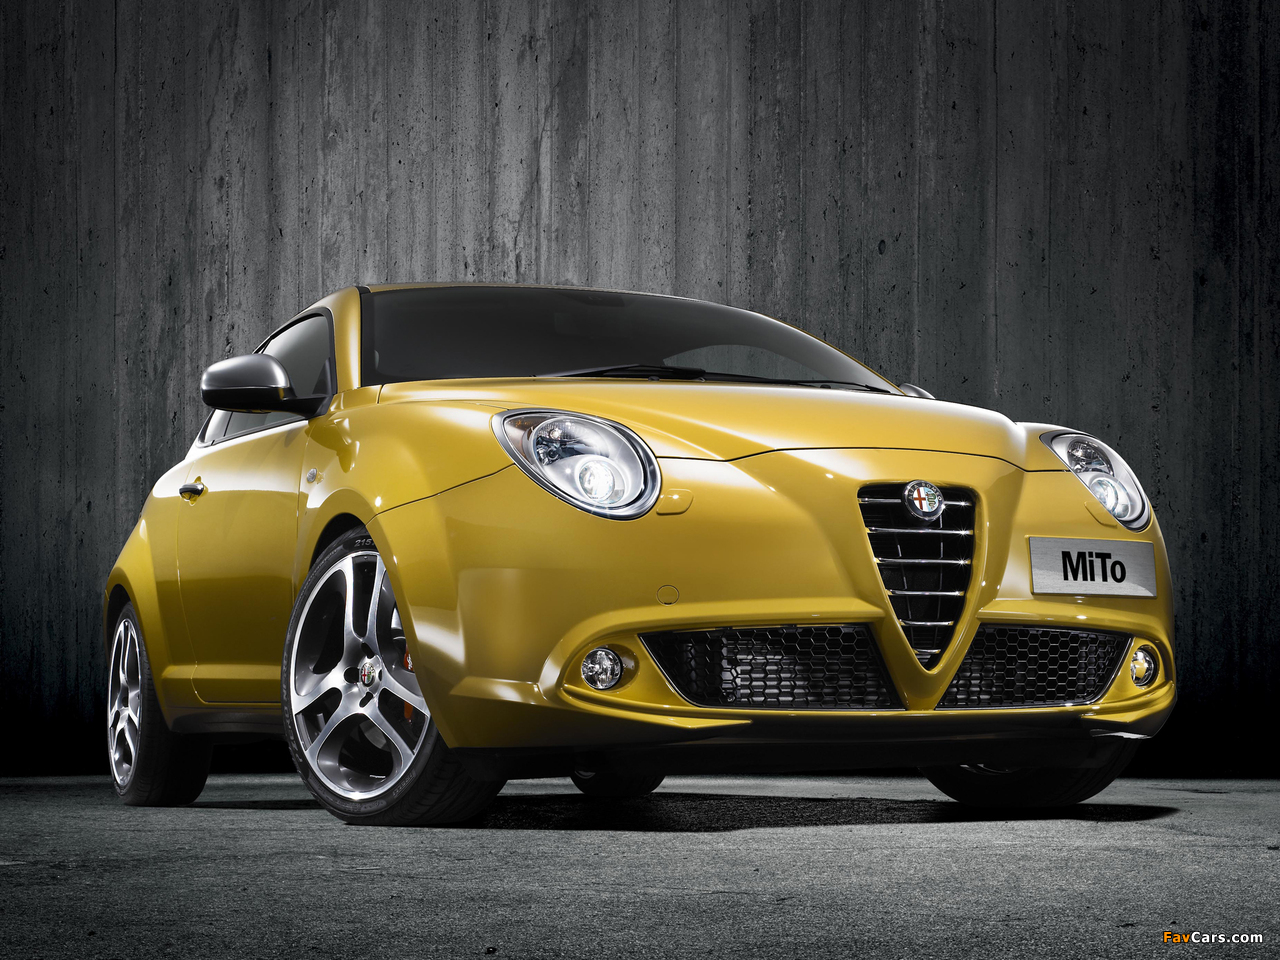 Alfa Romeo MiTo Imola 955 (2009) wallpapers (1280 x 960)